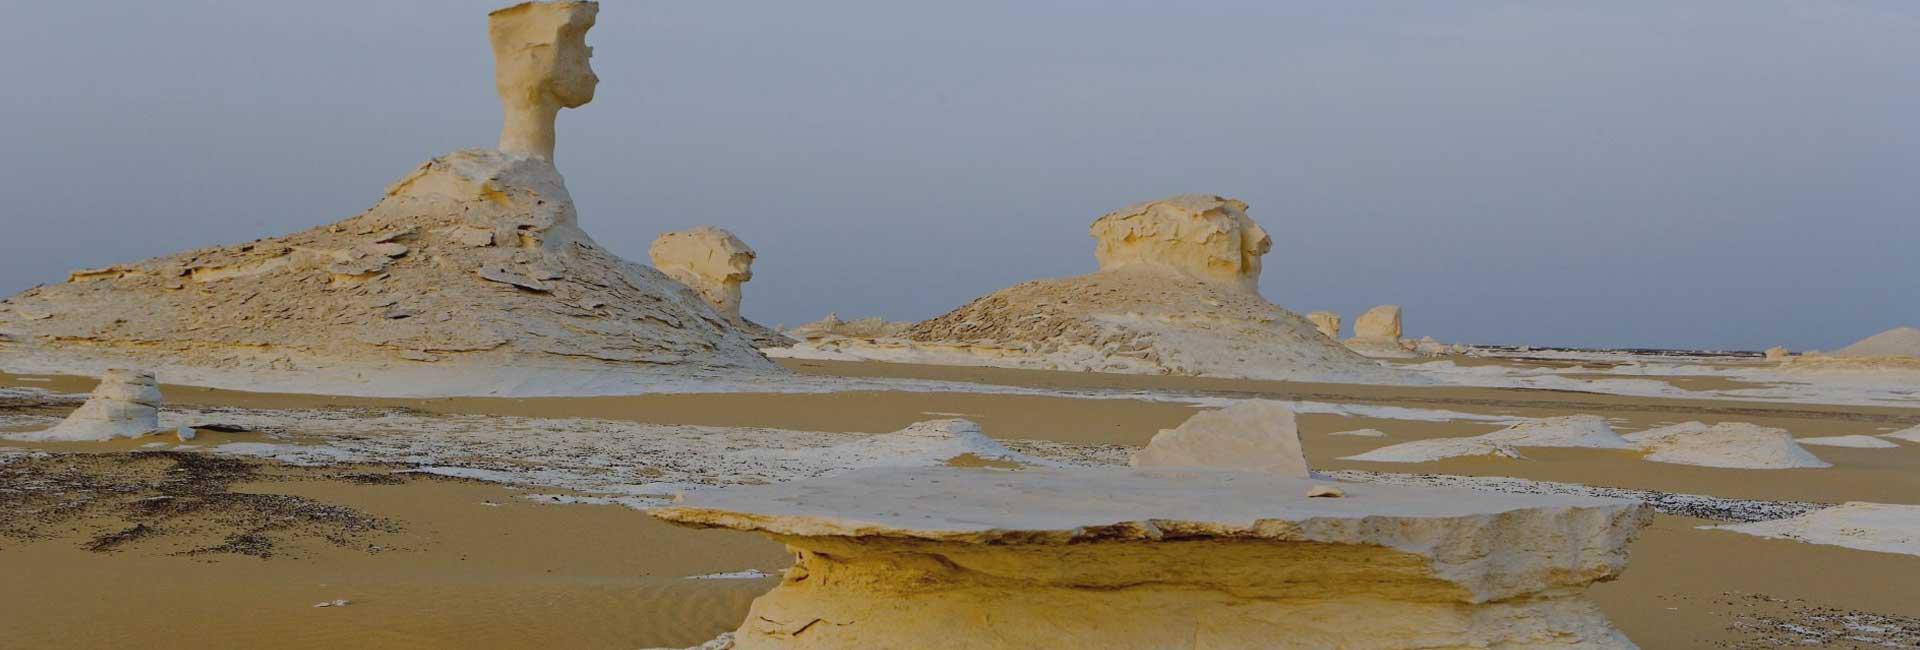 Farfara Oasis